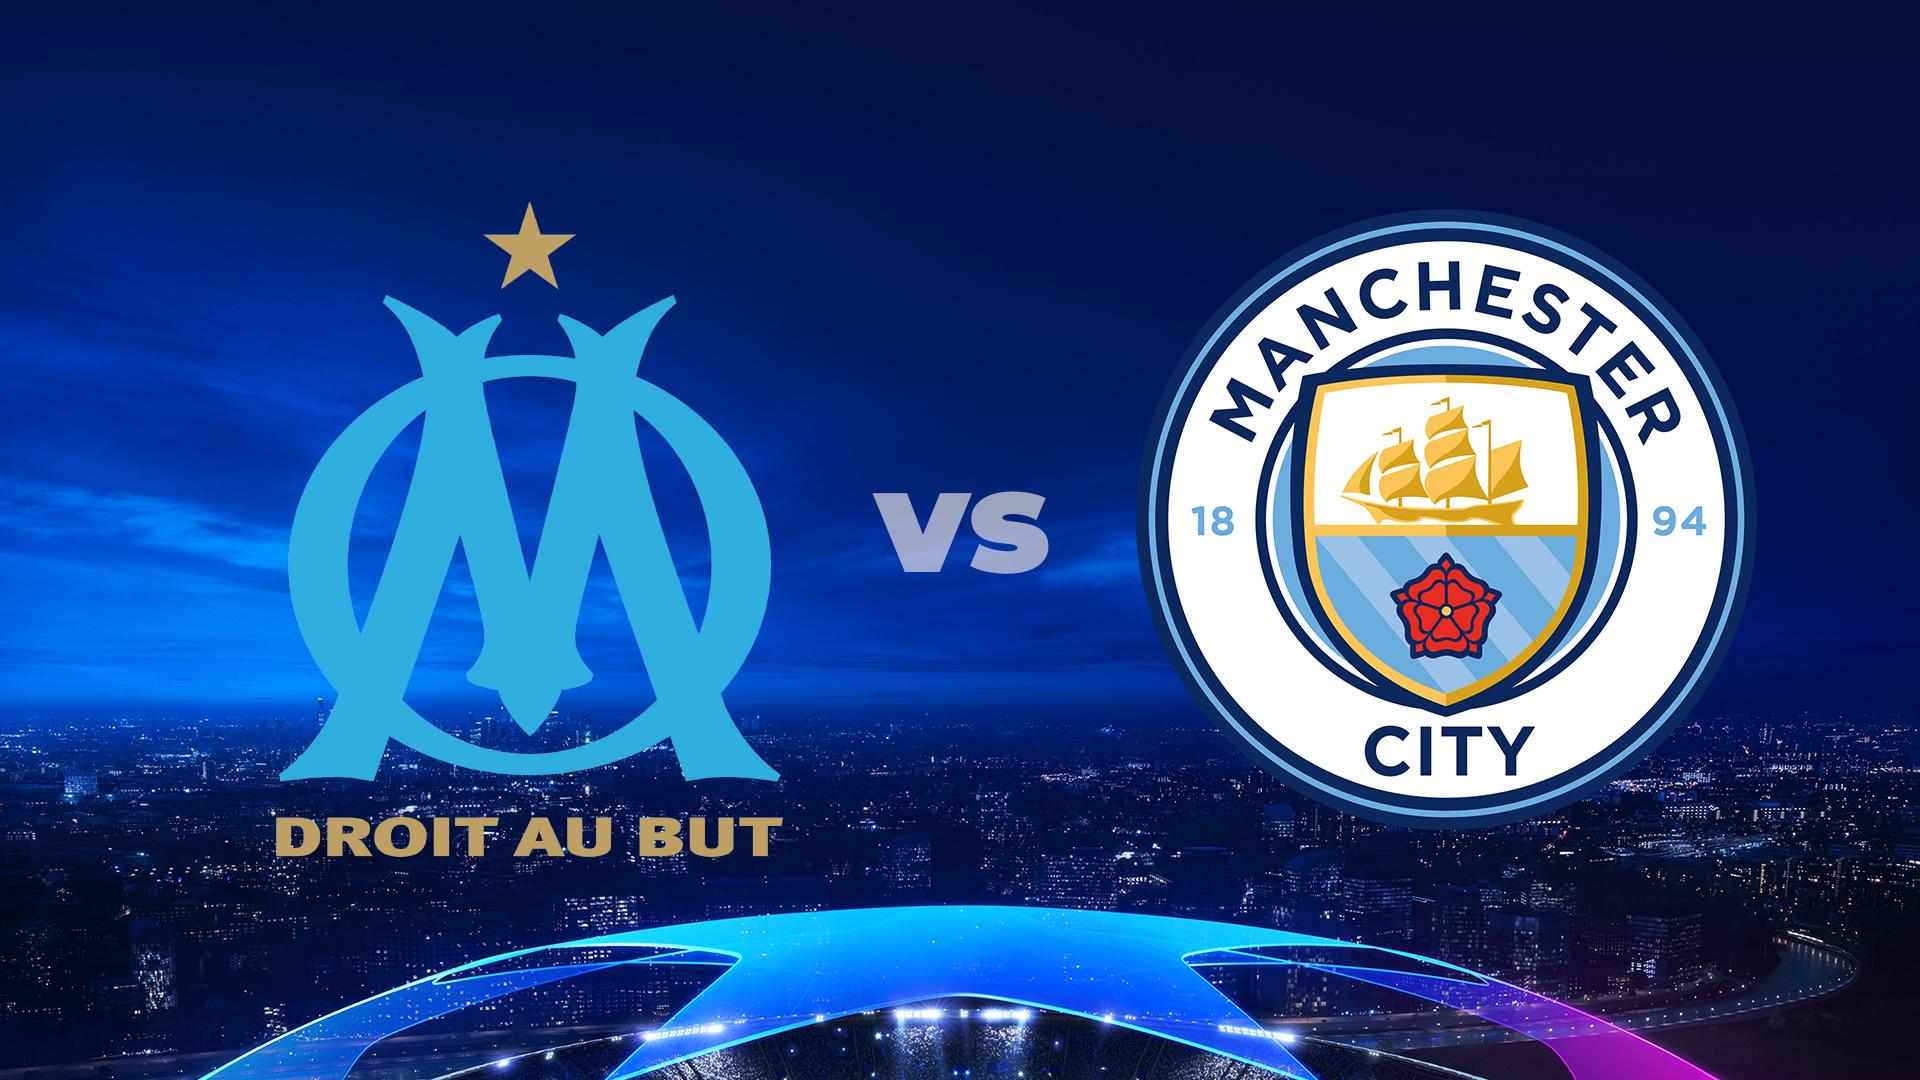 Olympique Marsylia - Manchester City